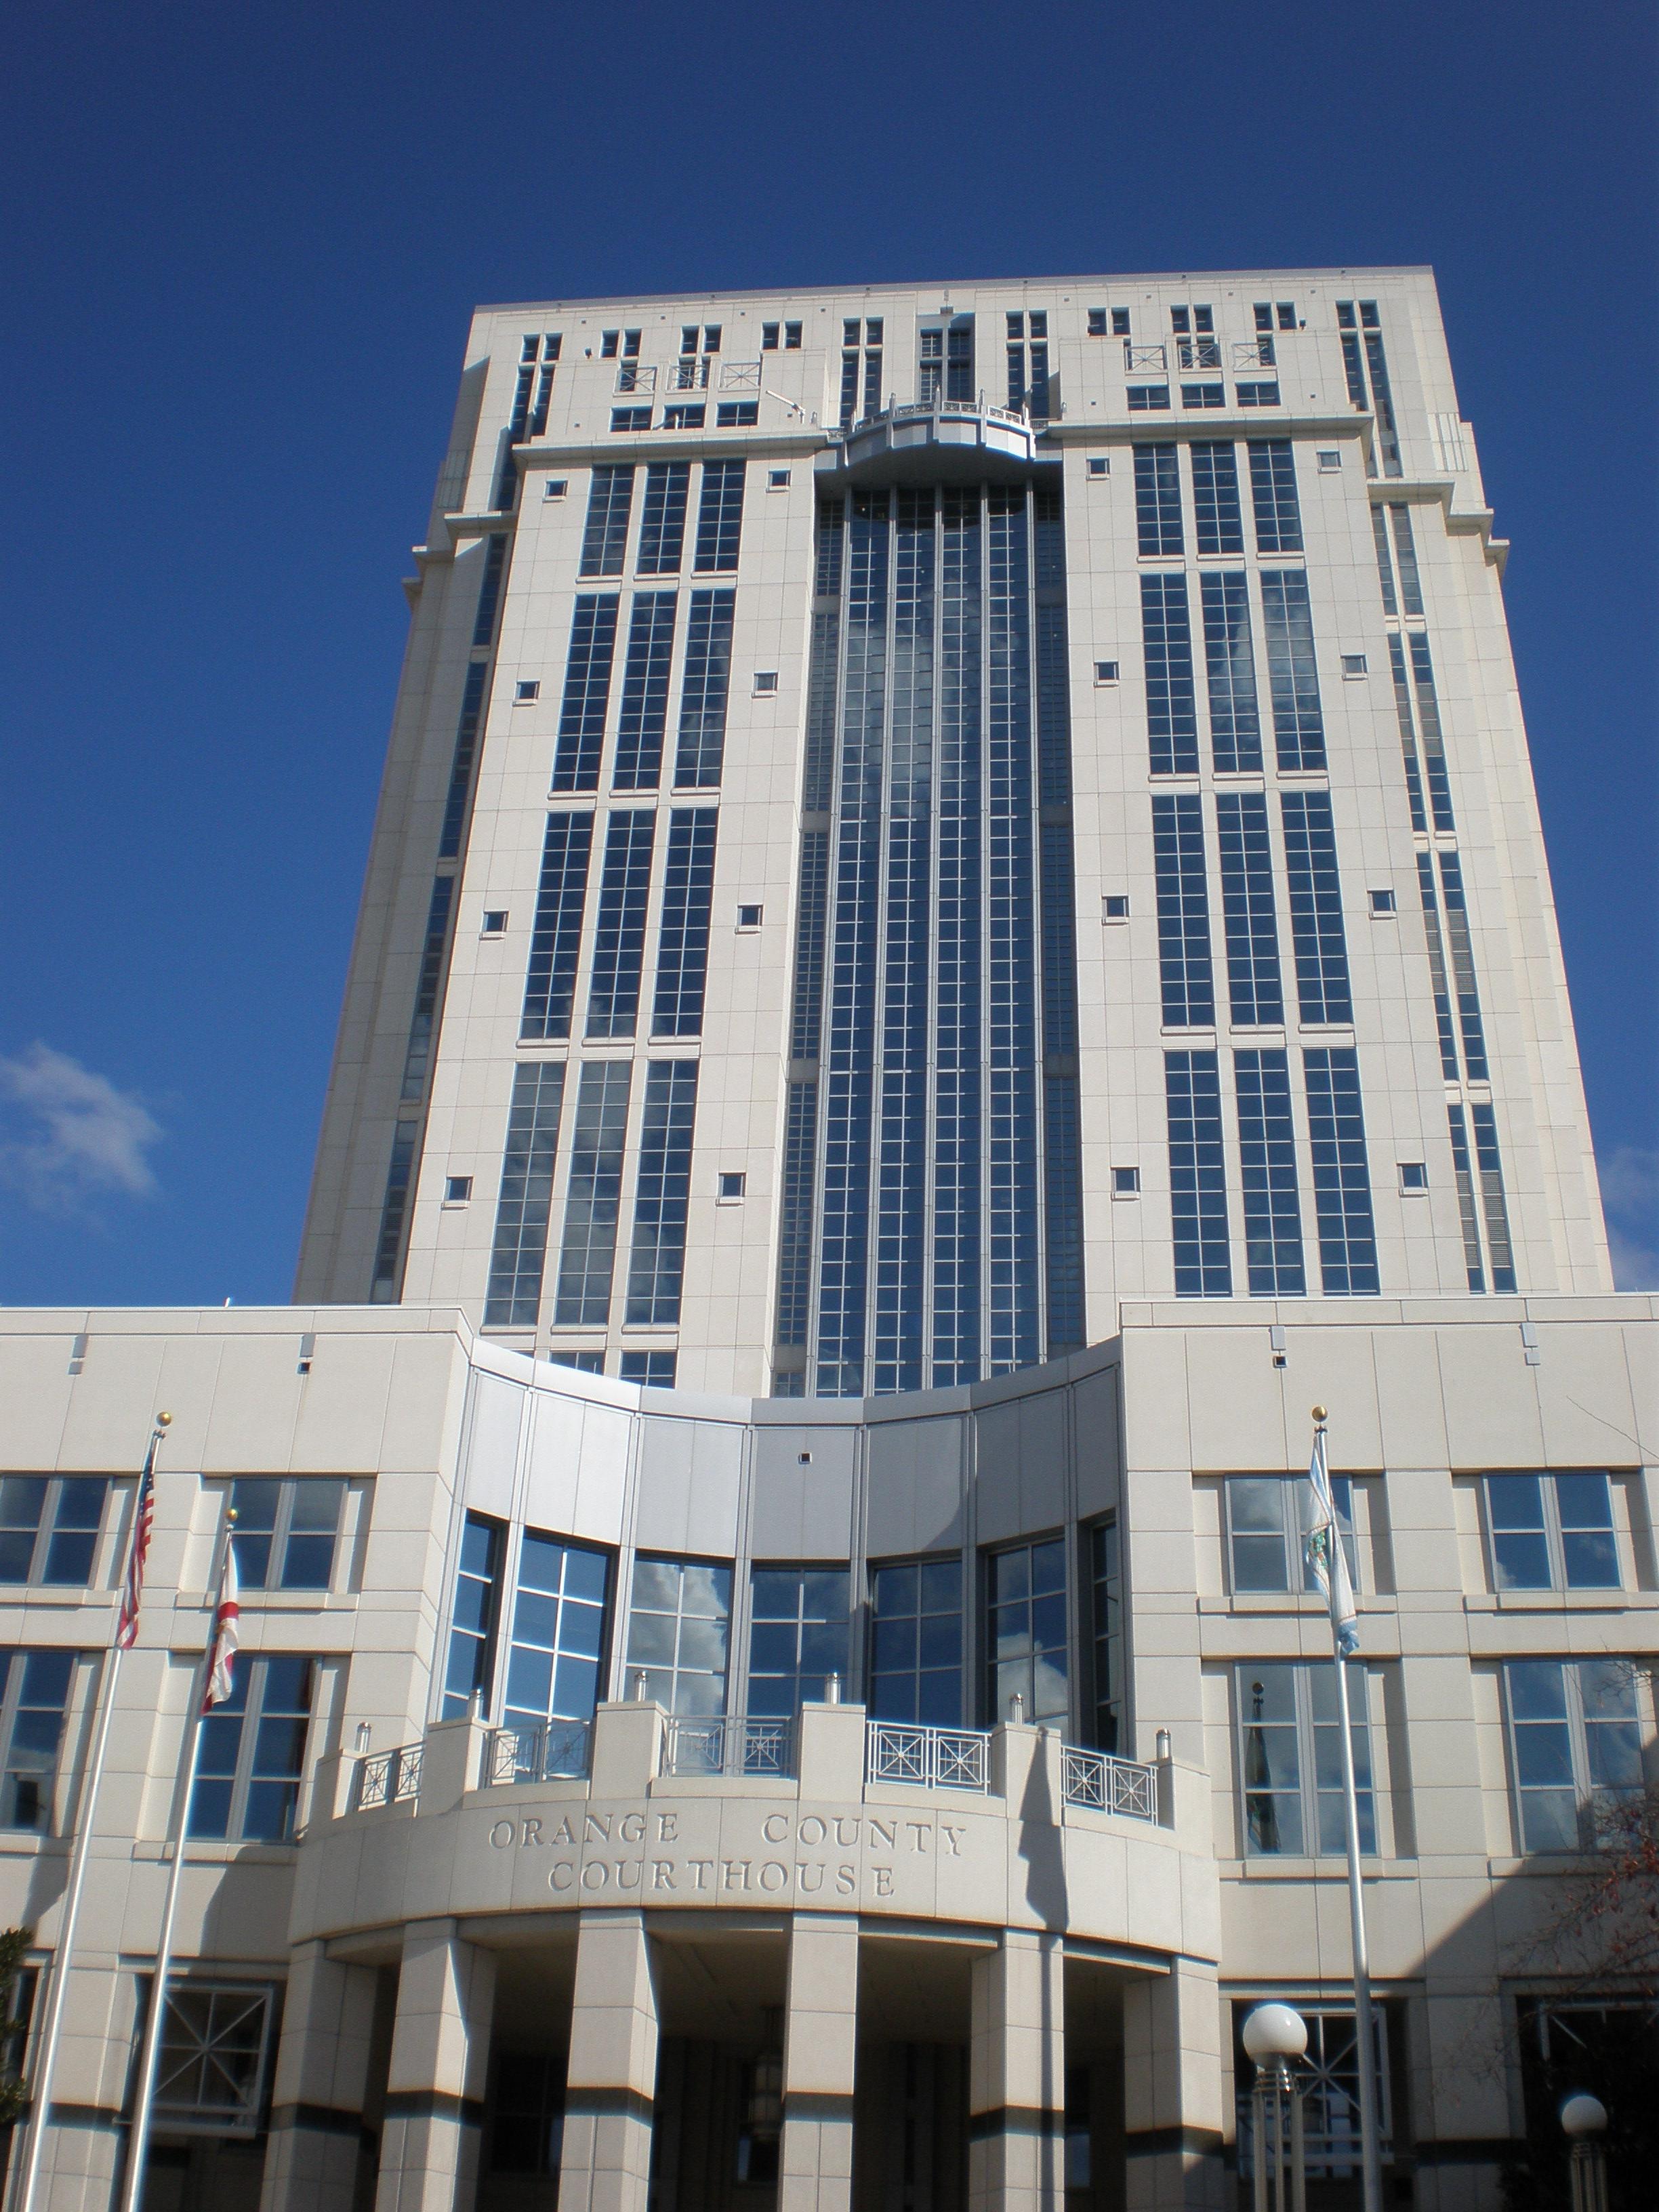 Orange county florida courthouse pics4learning - Orange county clerk s office ...